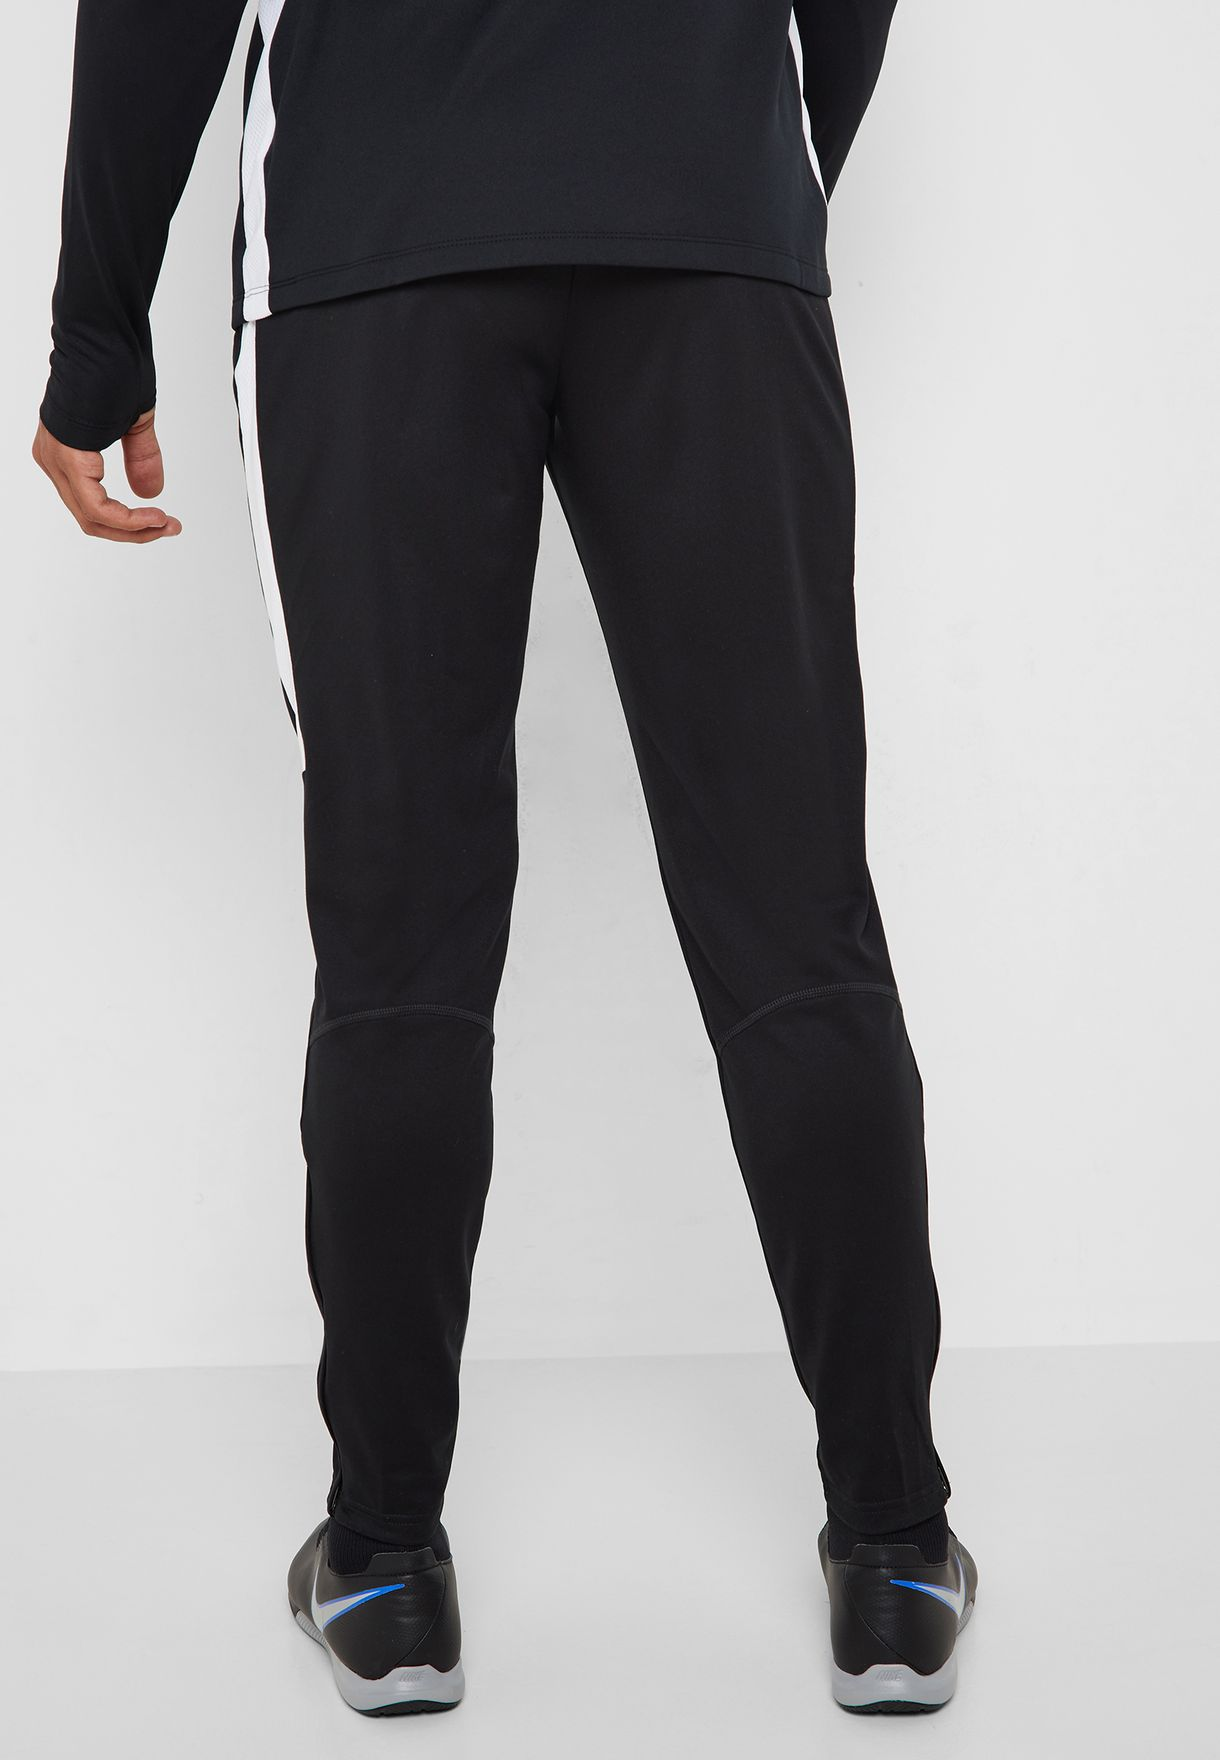 339ec4b20410 Shop Nike black Dri-FIT Academy Sweatpants AJ9729-010 for Men in ...